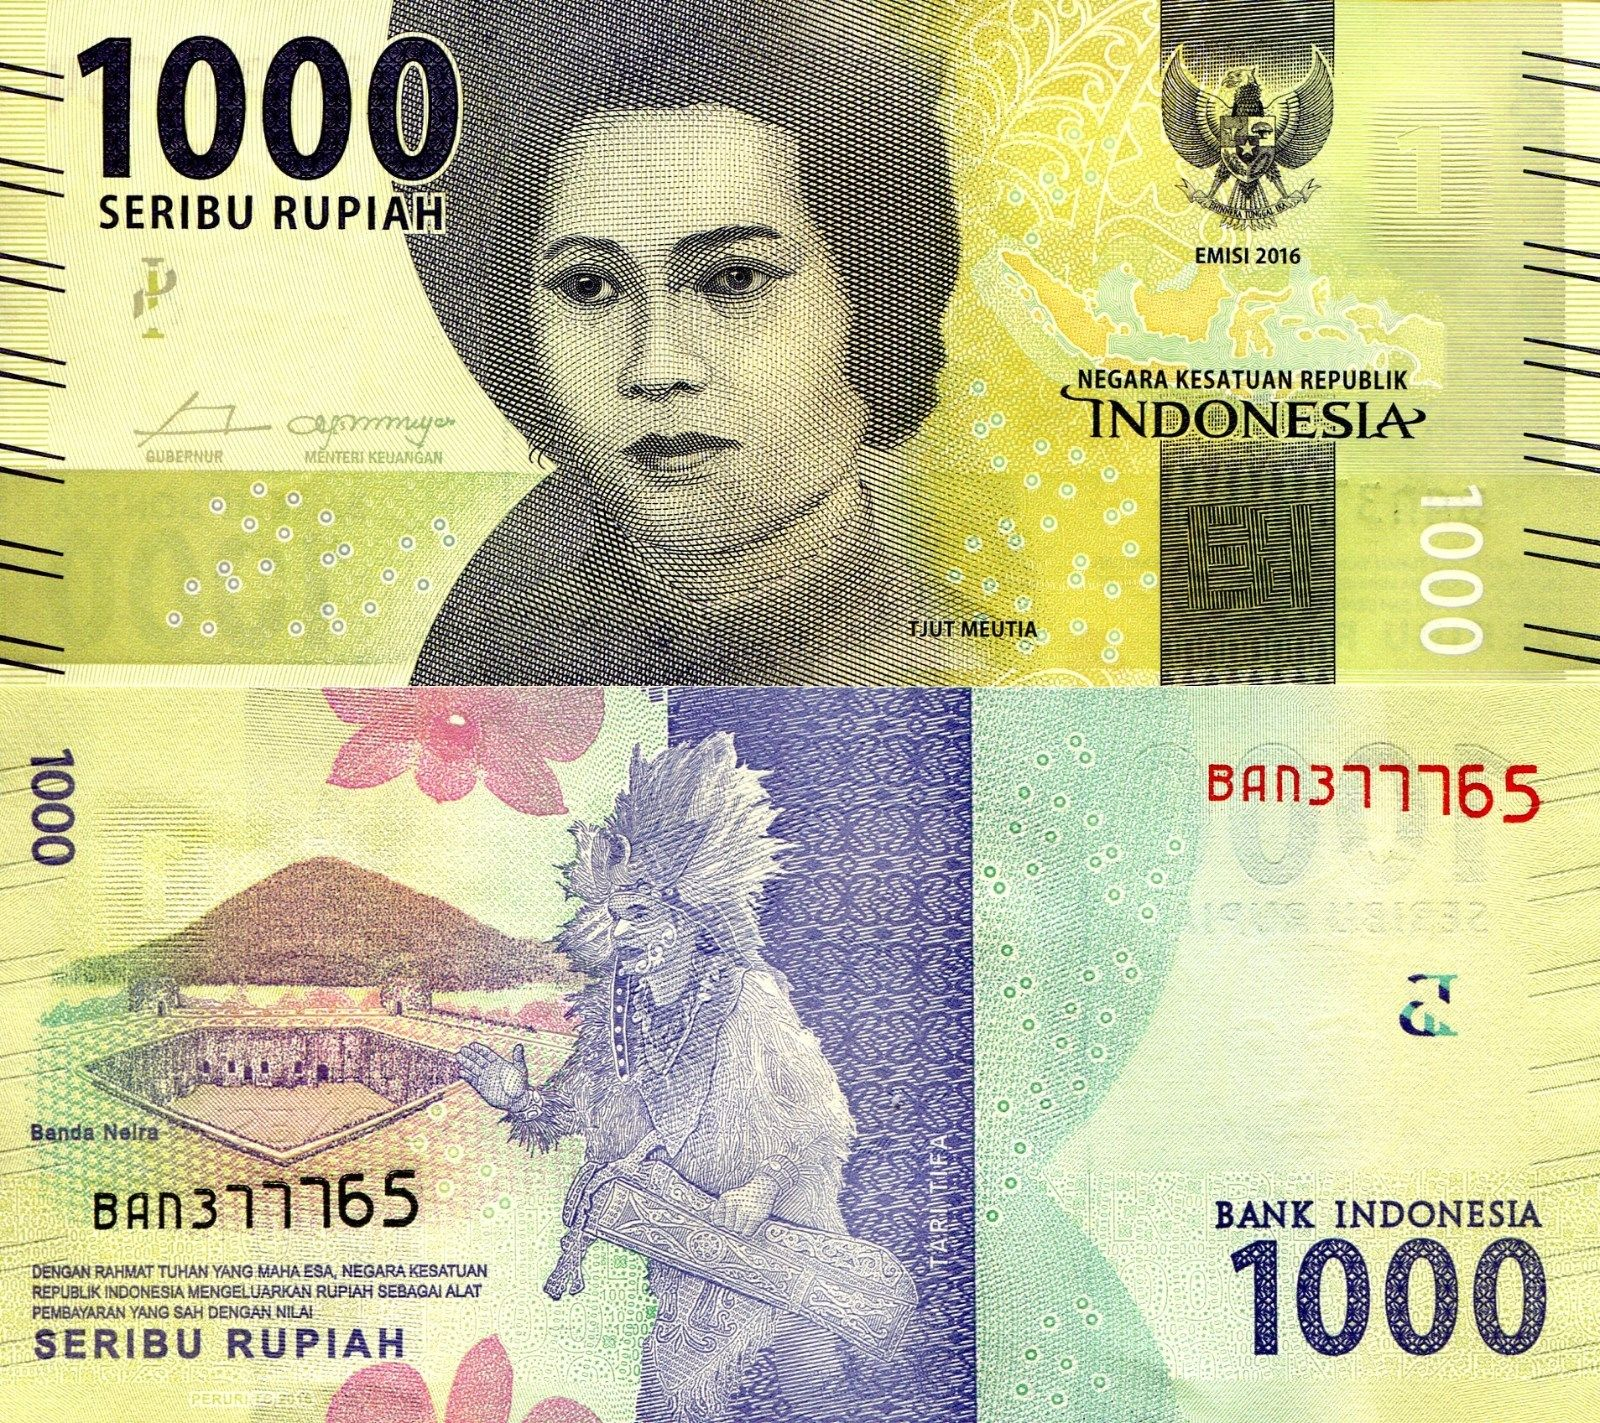 Indonesia 1000 Rupiah Banknote World Paper Money UNC Pick P-2016 | eBay